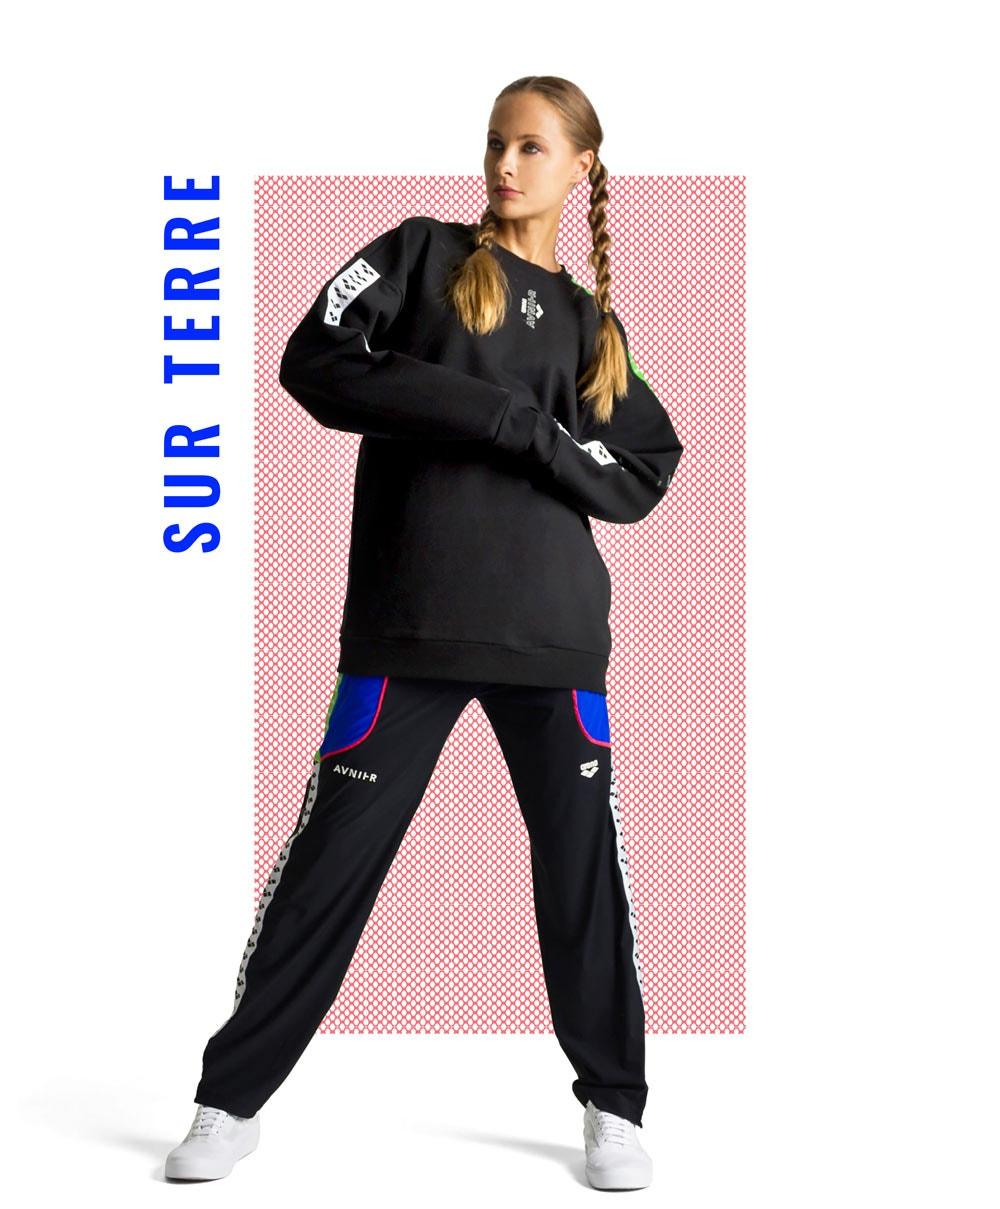 arena avnier streetwear femme